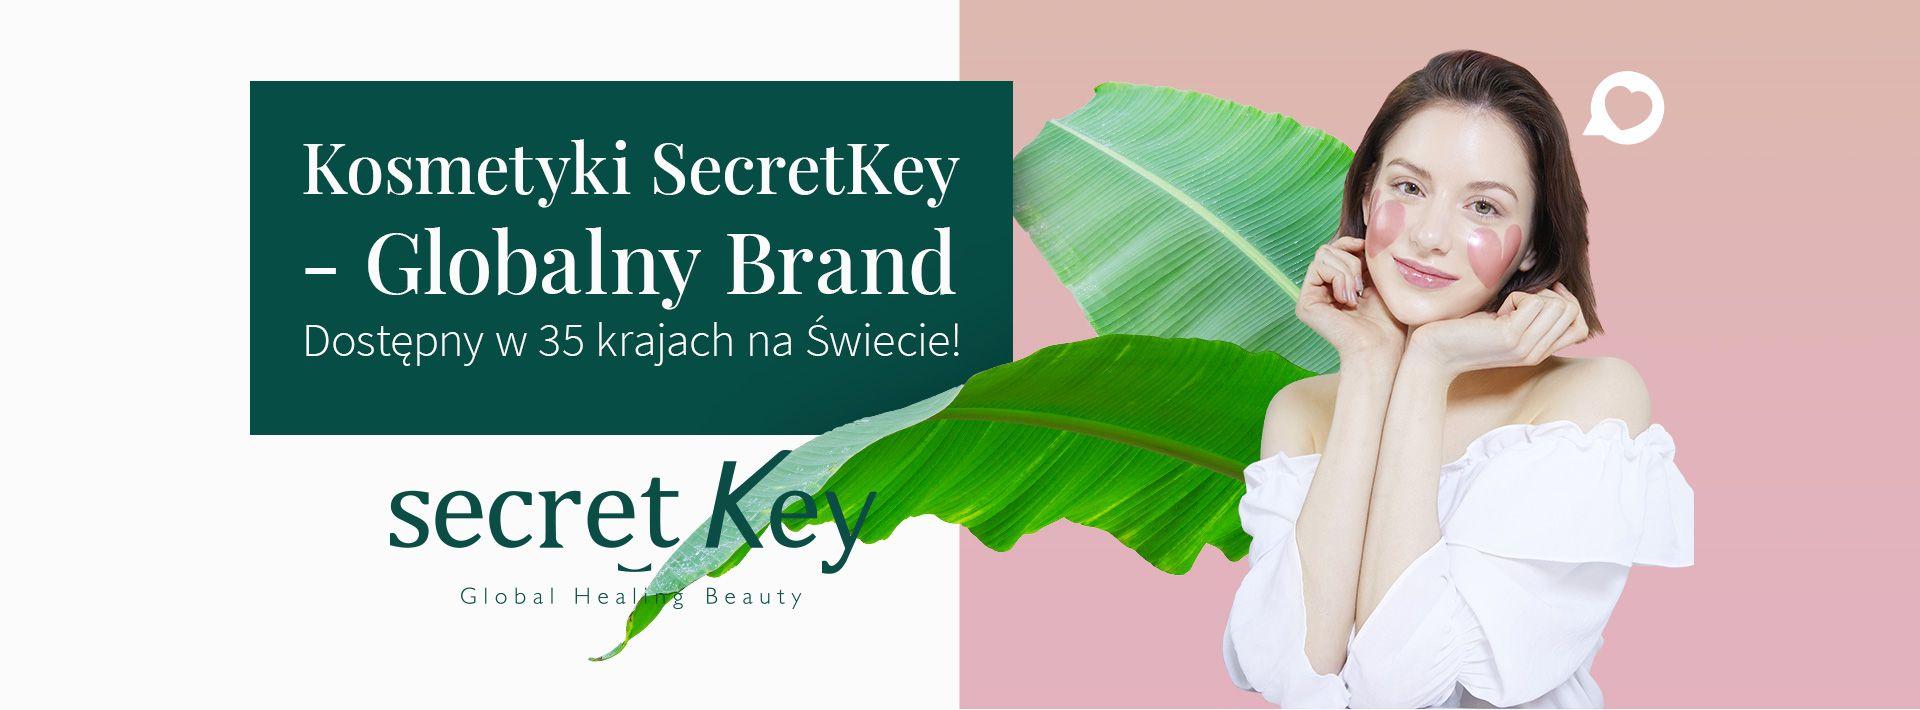 Kosmetyki SecretKey - Globalny Brand